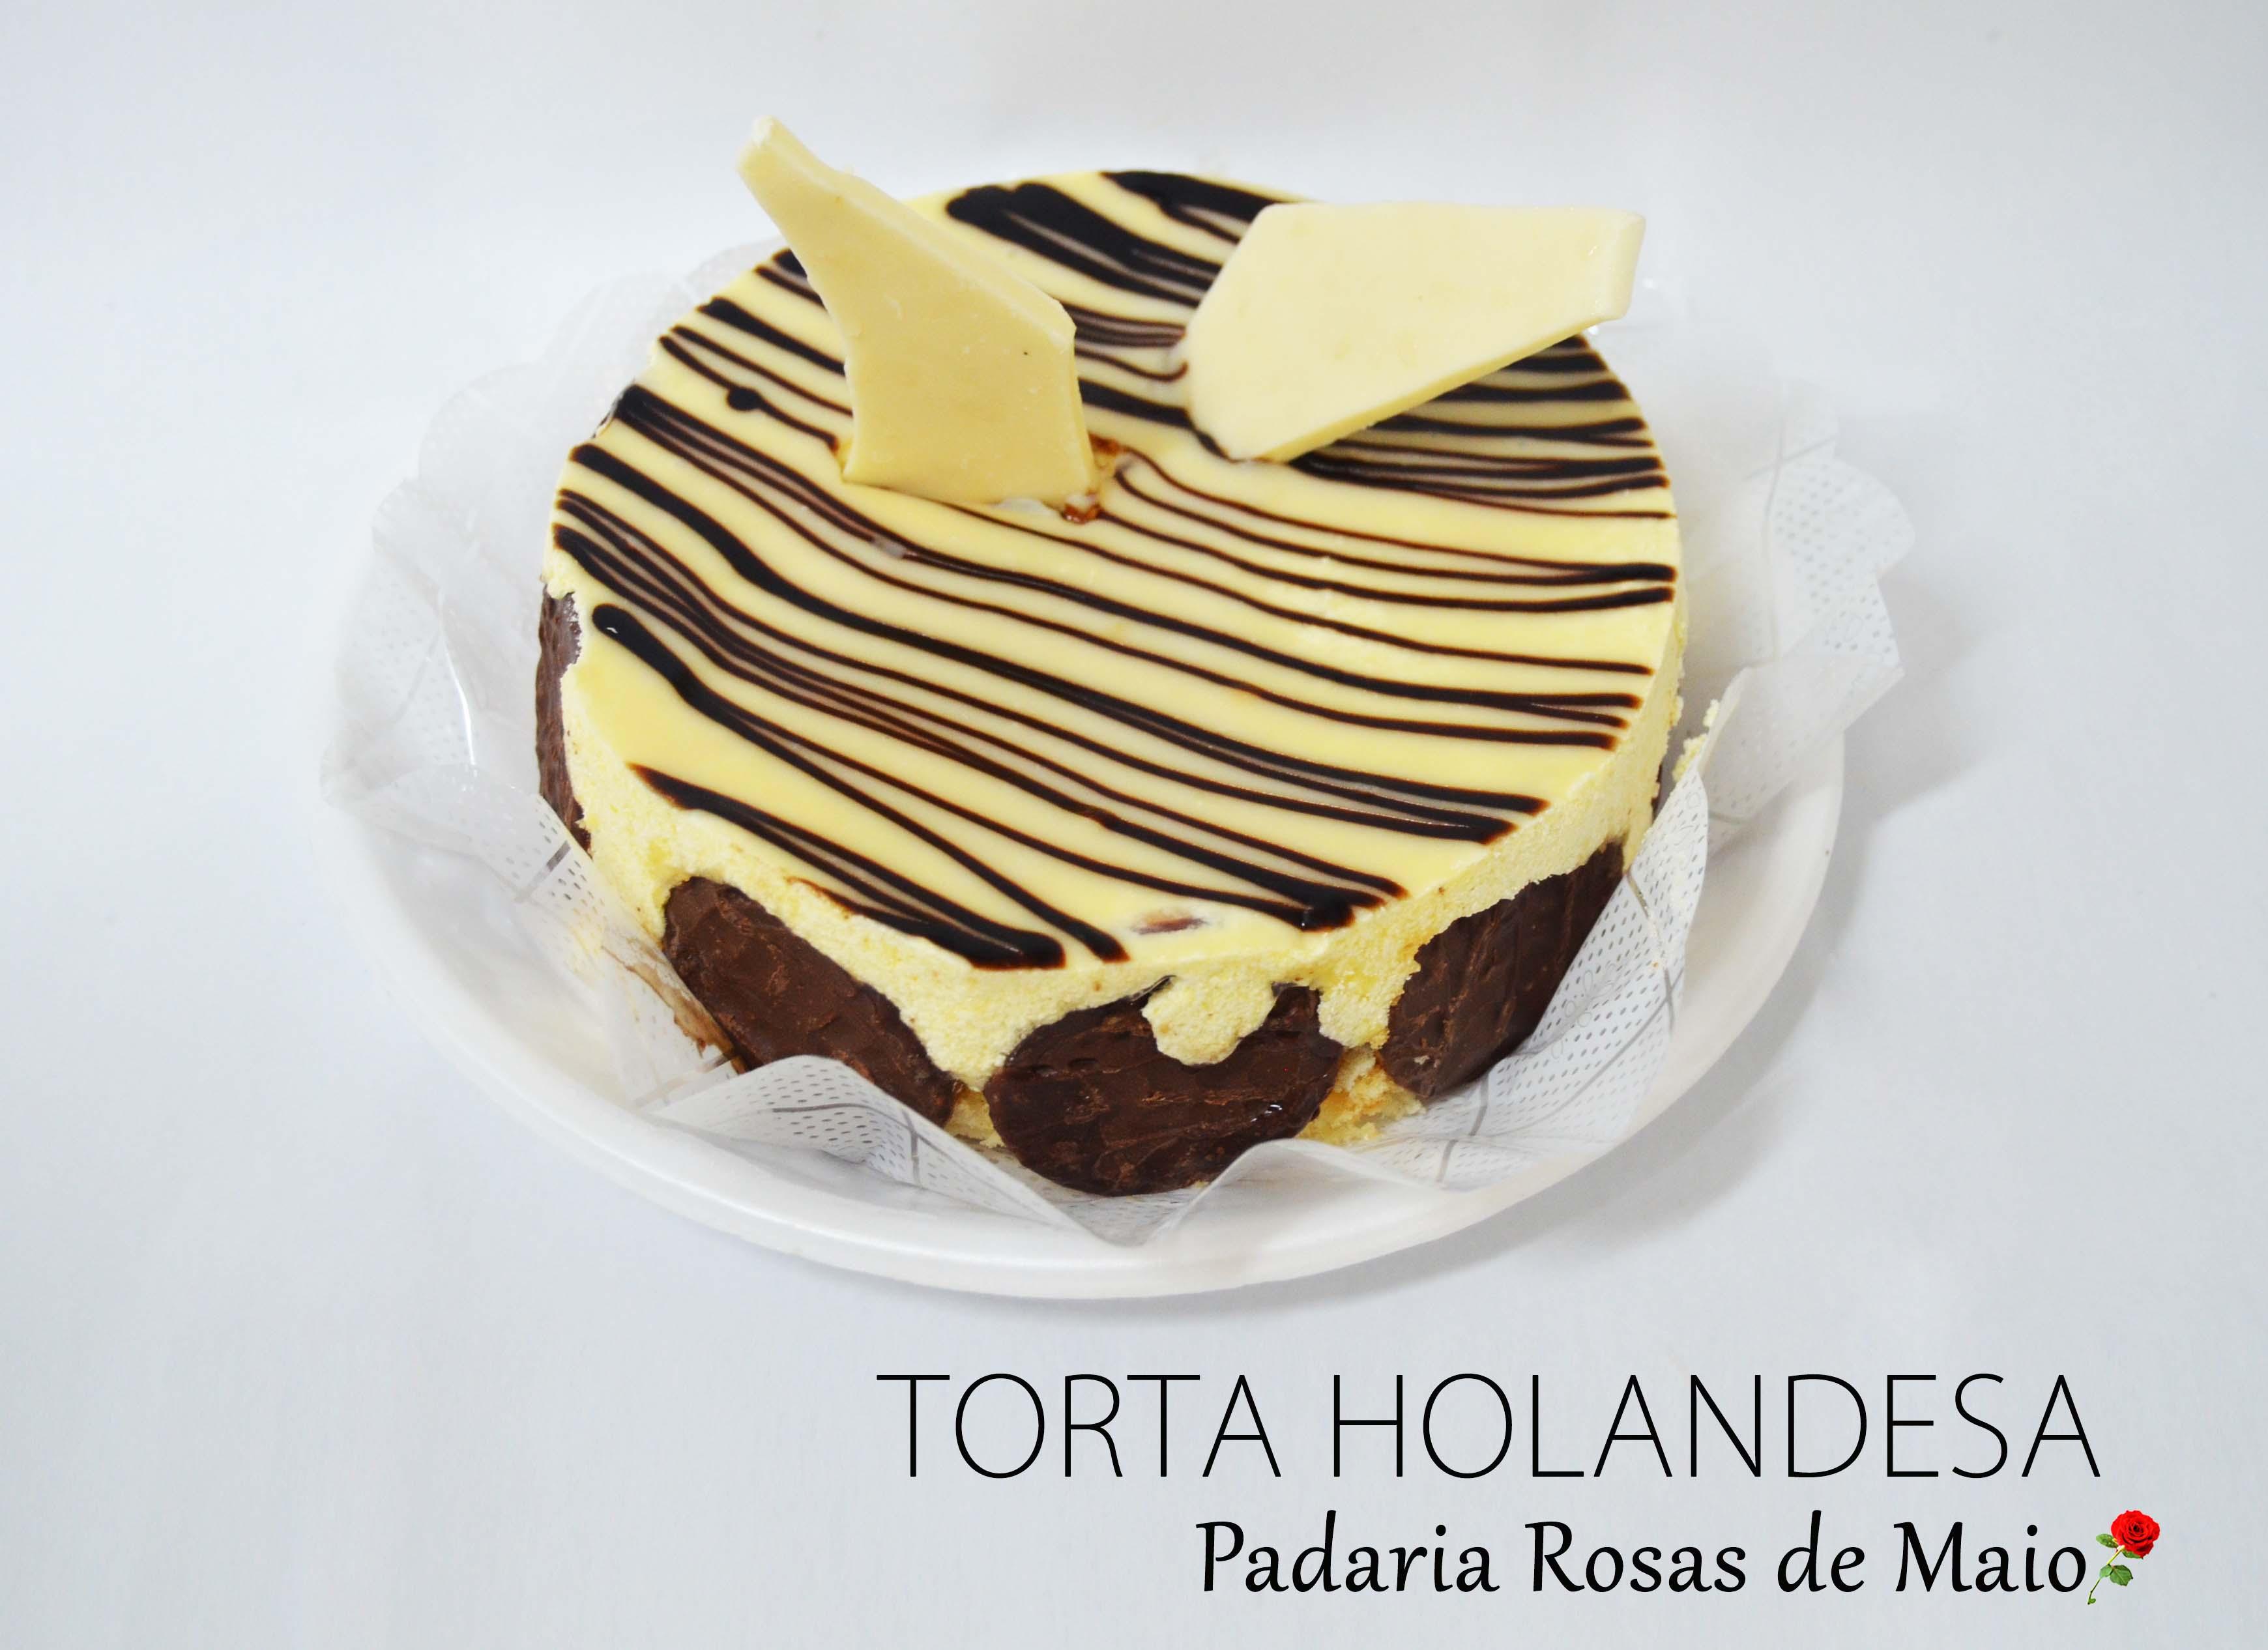 59. torta holandesa